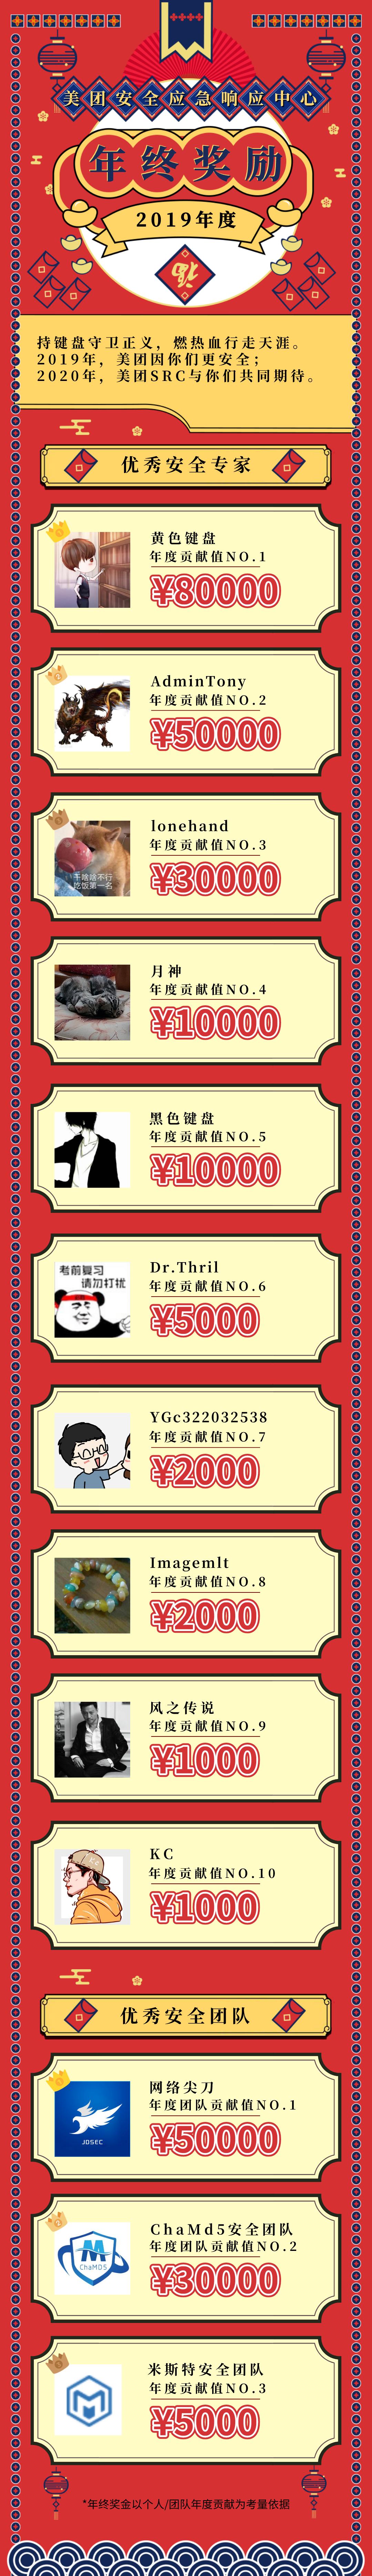 年终奖_自定义px_2020-01-02-0.png